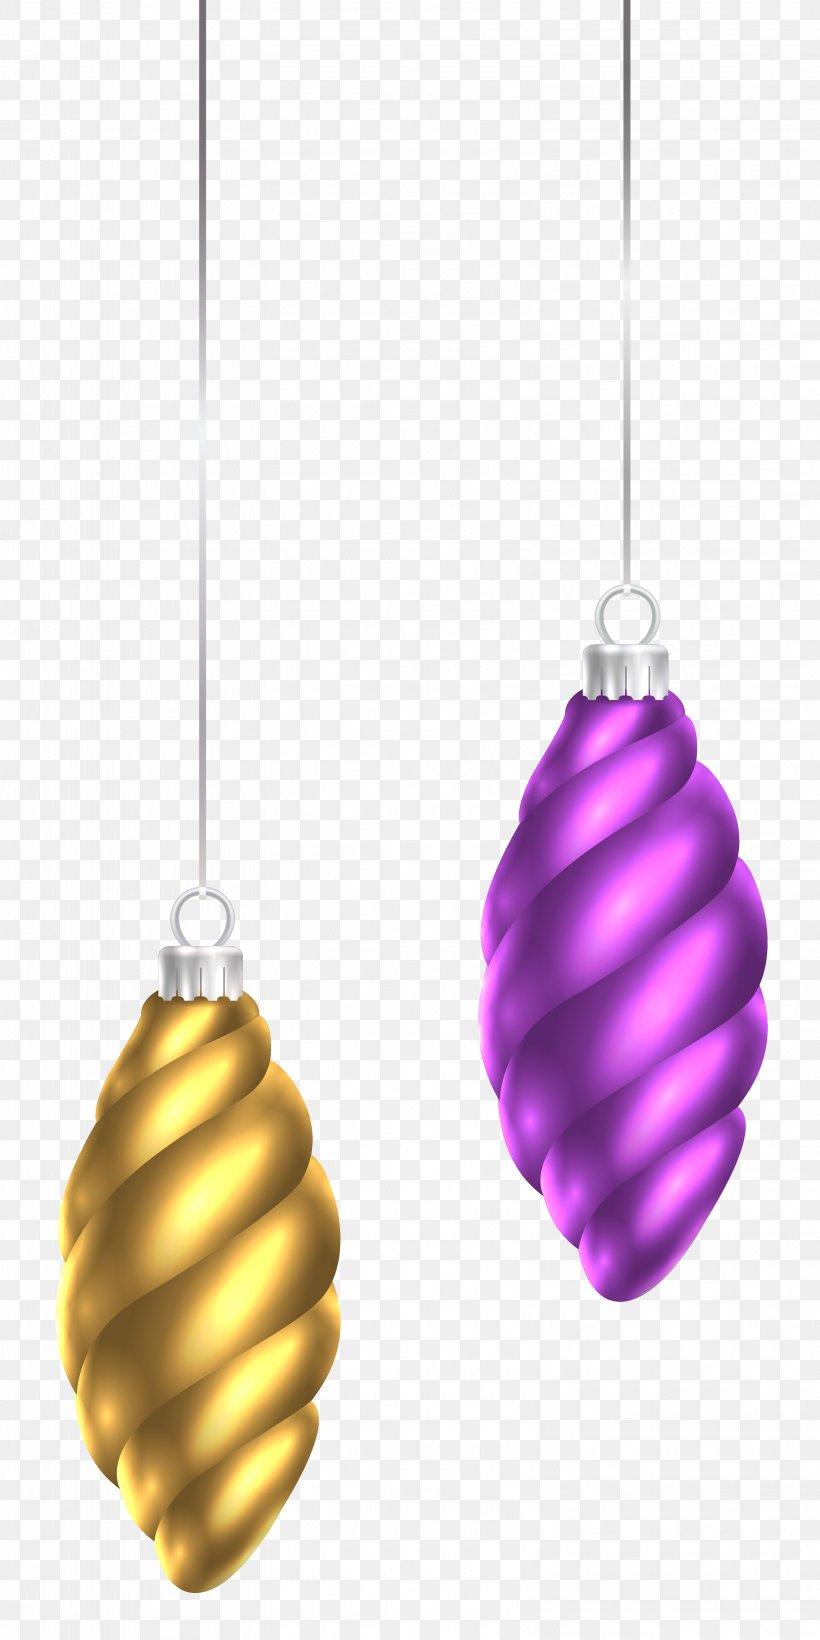 Christmas Ornament Christmas Decoration Clip Art, PNG, 3158x6316px, Christmas Ornament, Christmas, Christmas Tree, Jose Gabriel Del Rosario Brochero, Pope Download Free